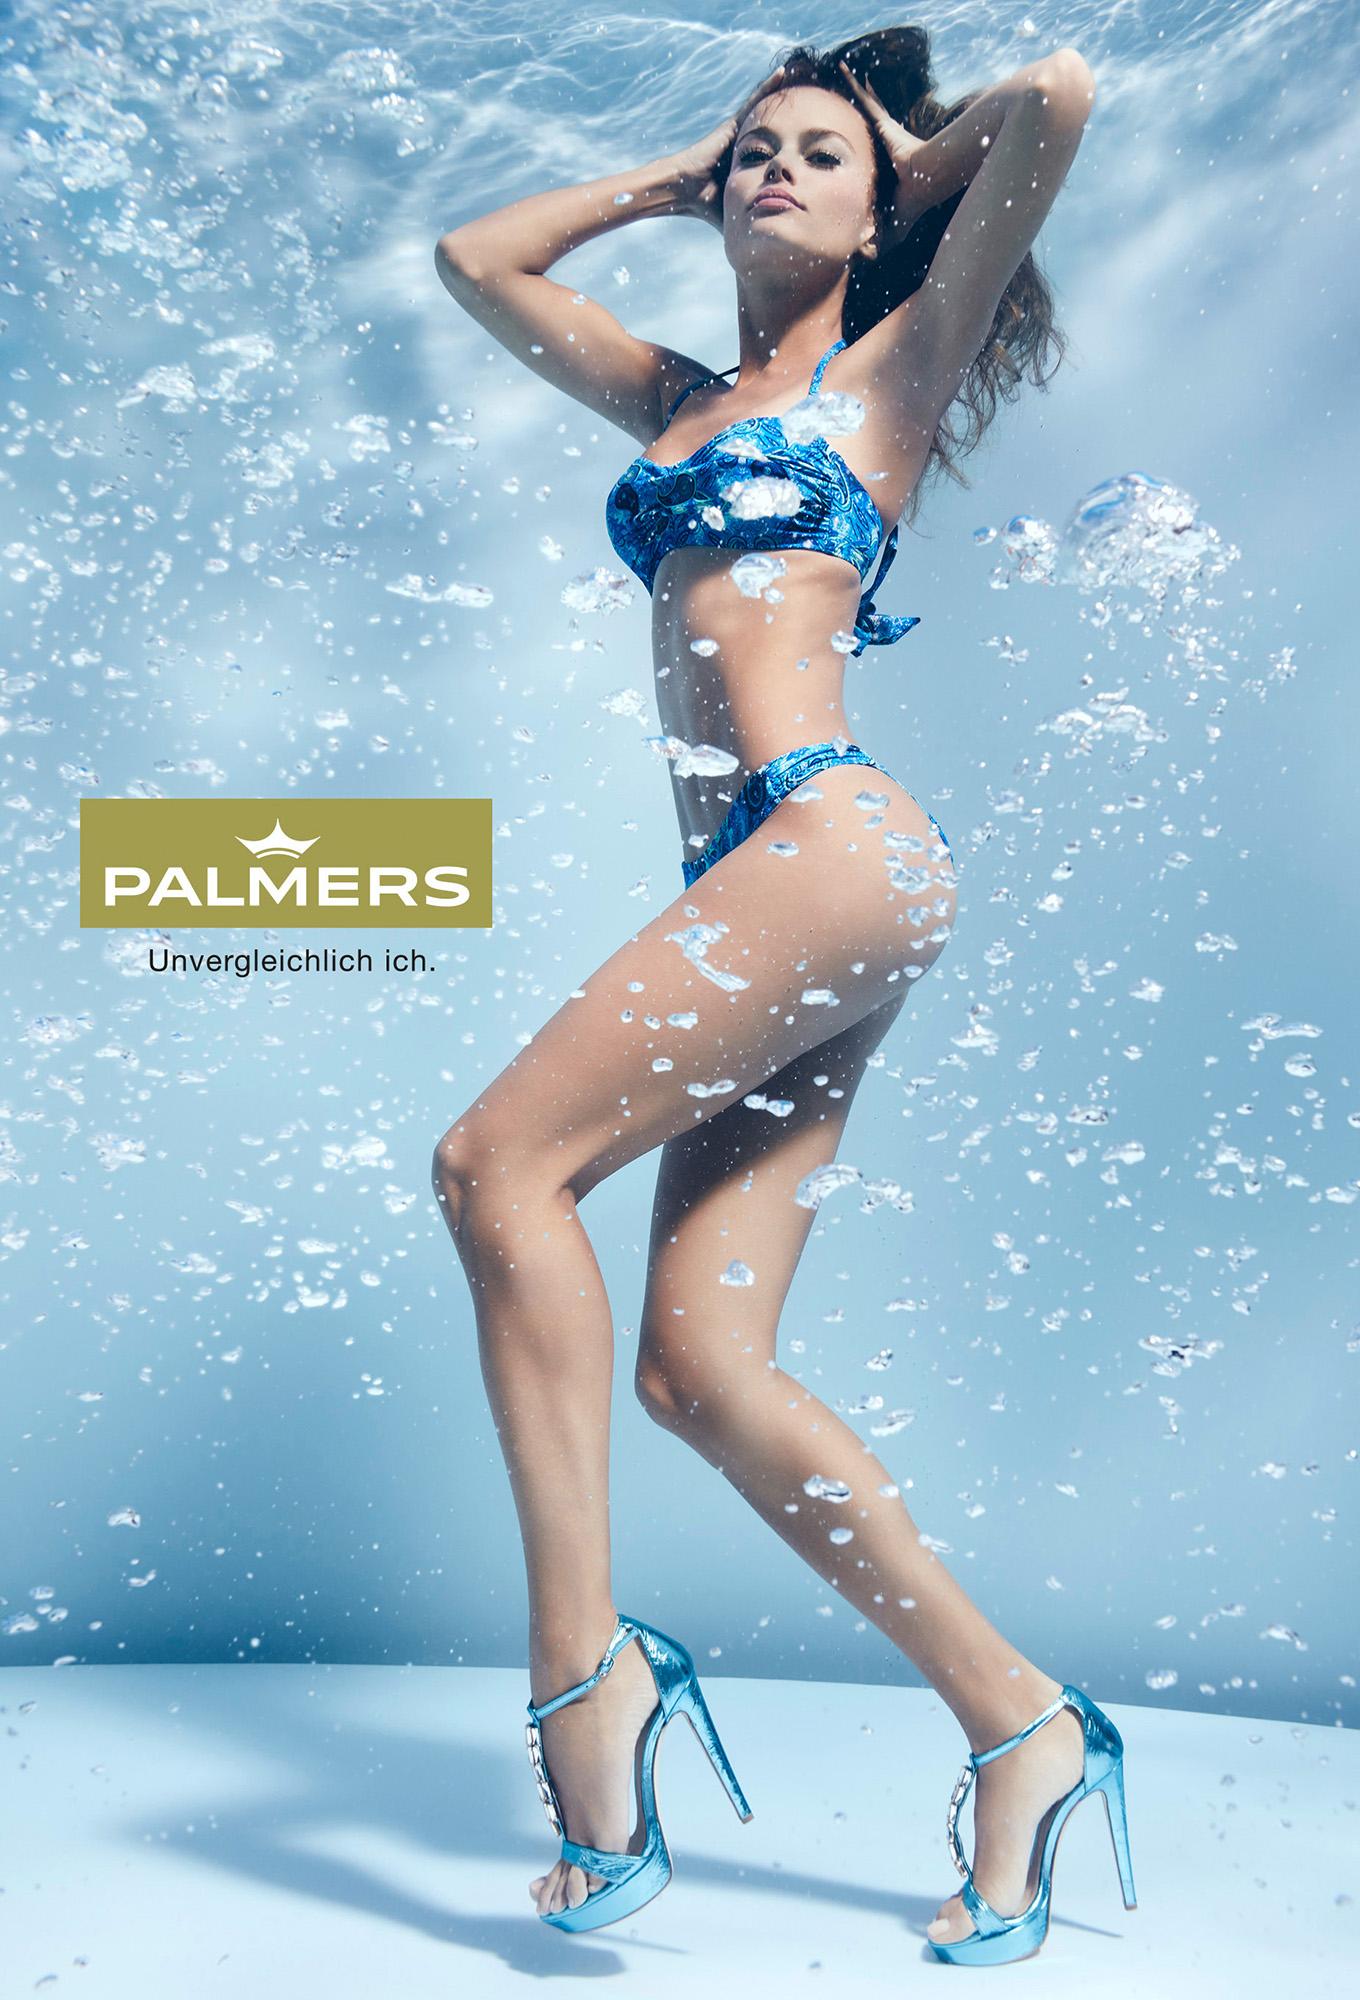 Susanne Stemmer girl standing on bottom of swimming pool in bikini and high heals